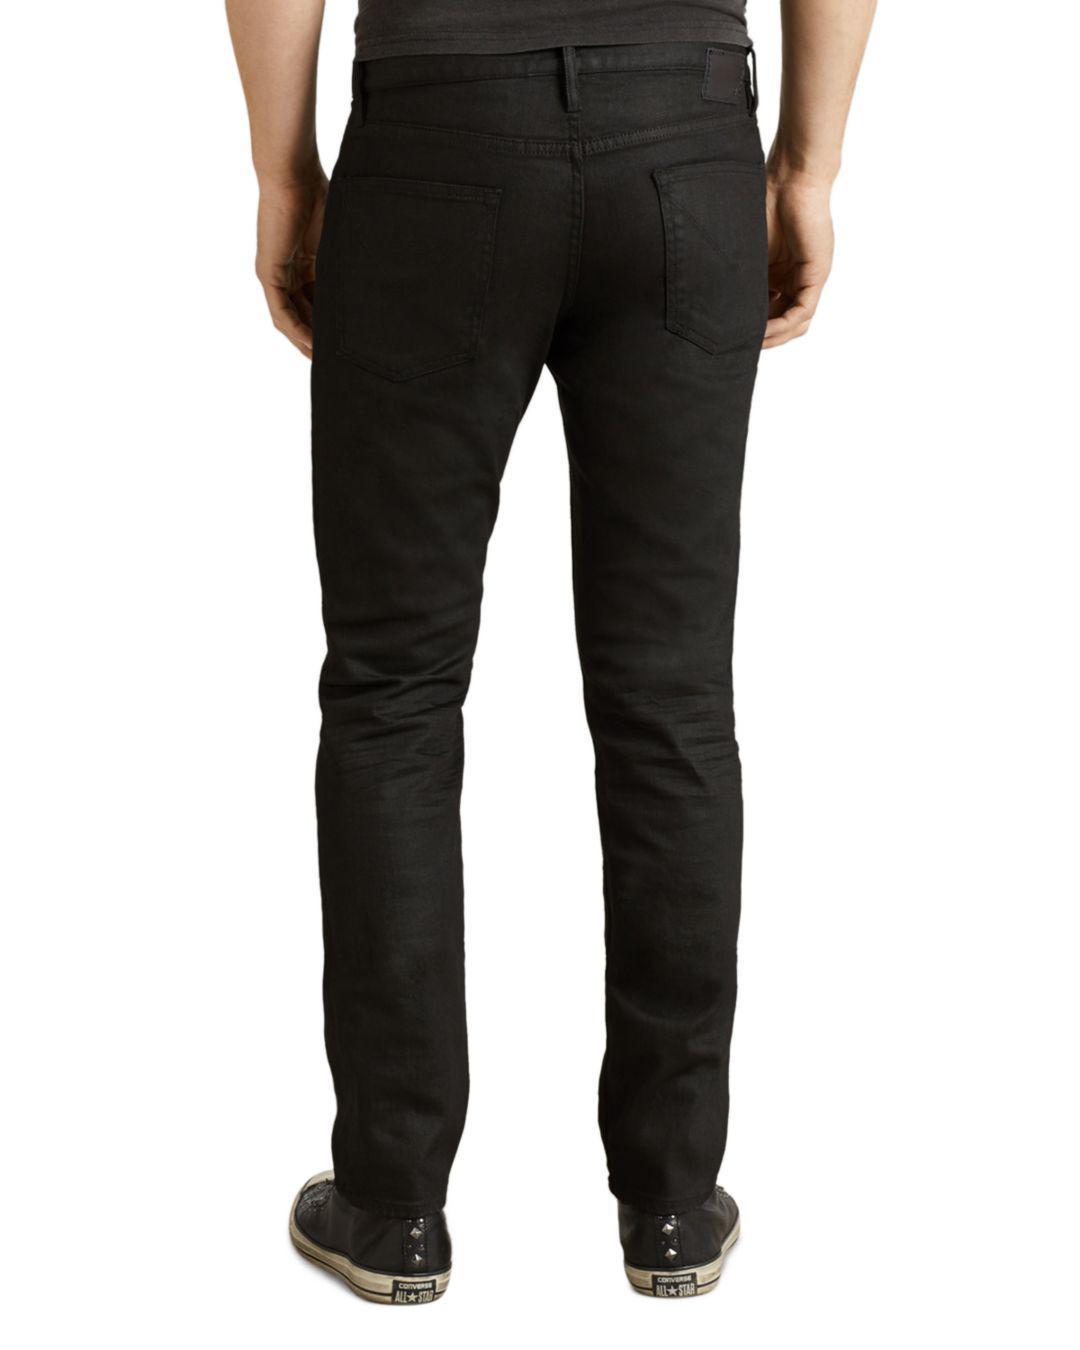 John Varvatos Denim Bowery Slim Straight Fit Jeans In Jet Black for Men